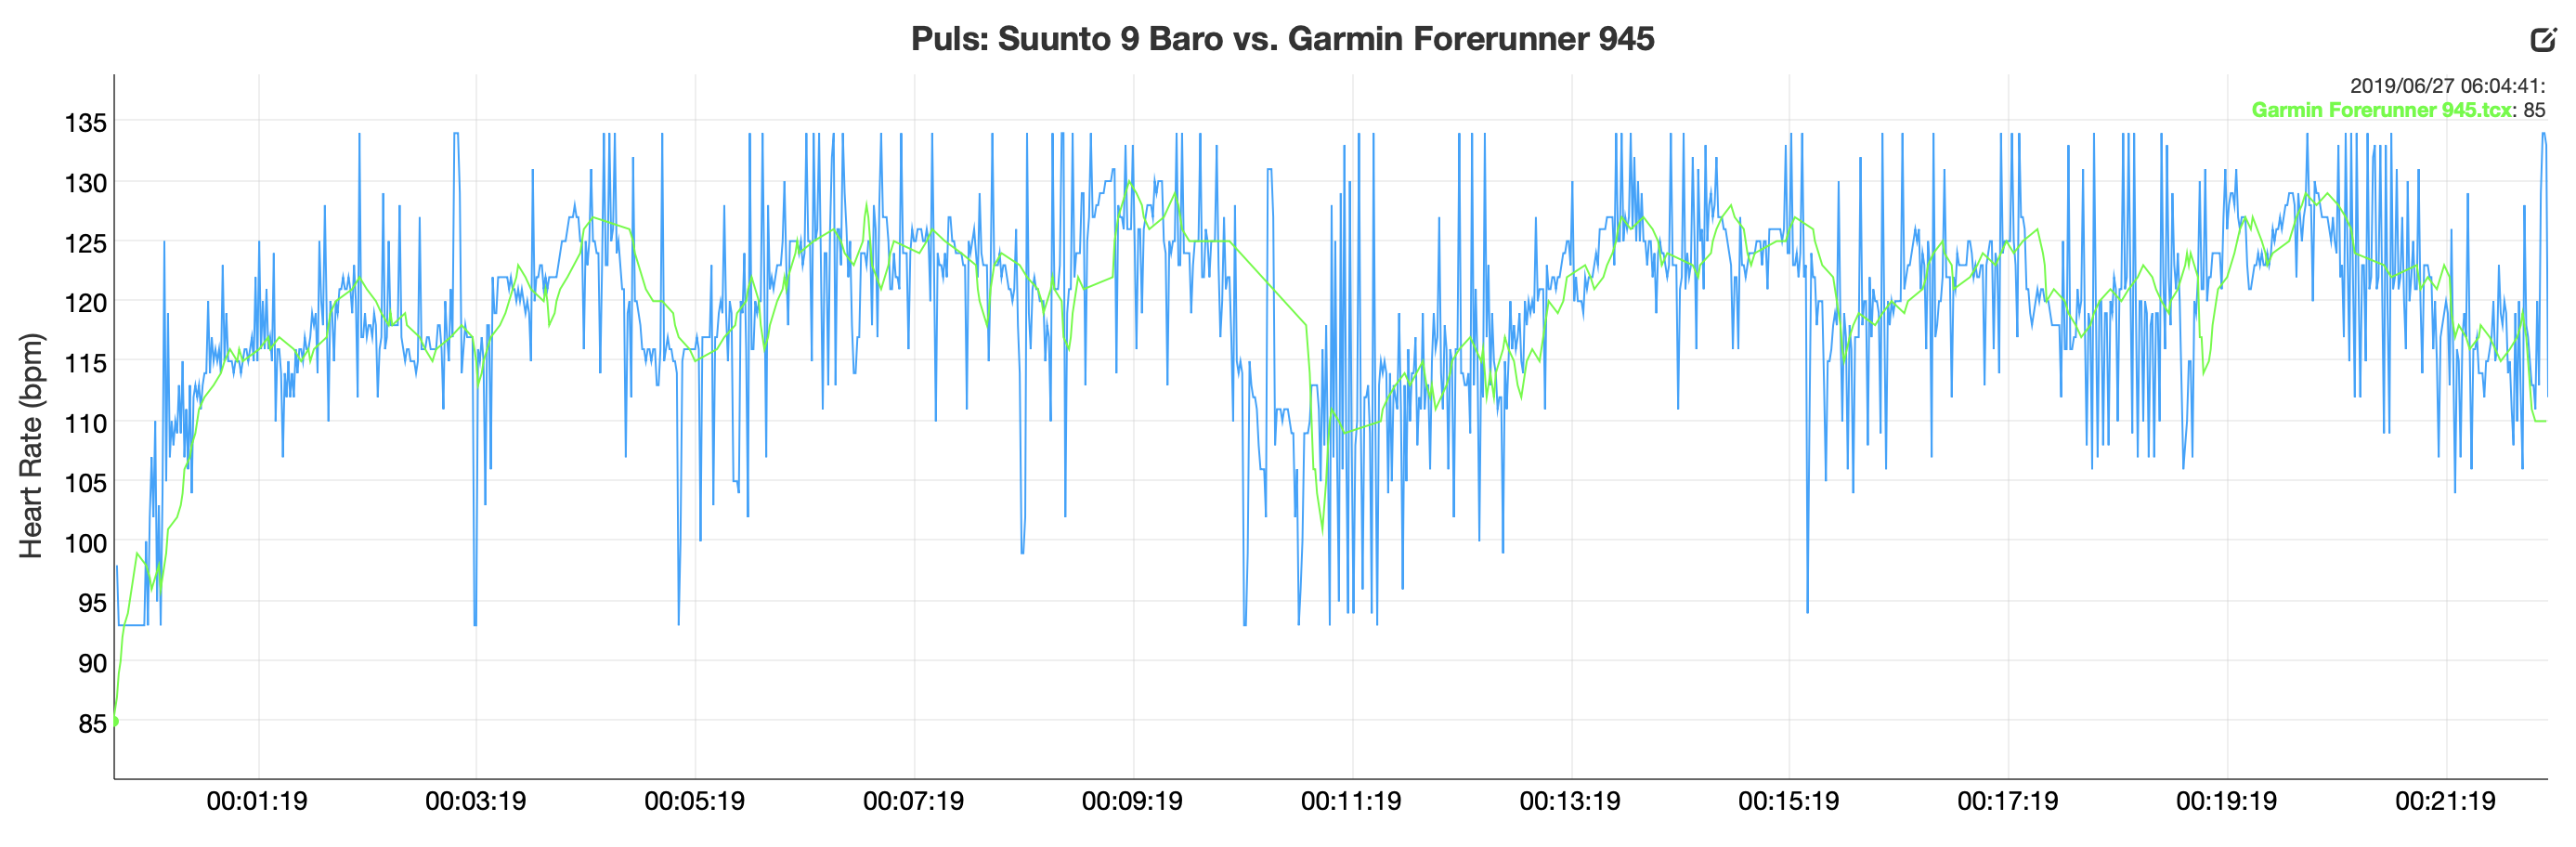 Garmin Forerunner 945 vs. Suunto 9 Baro